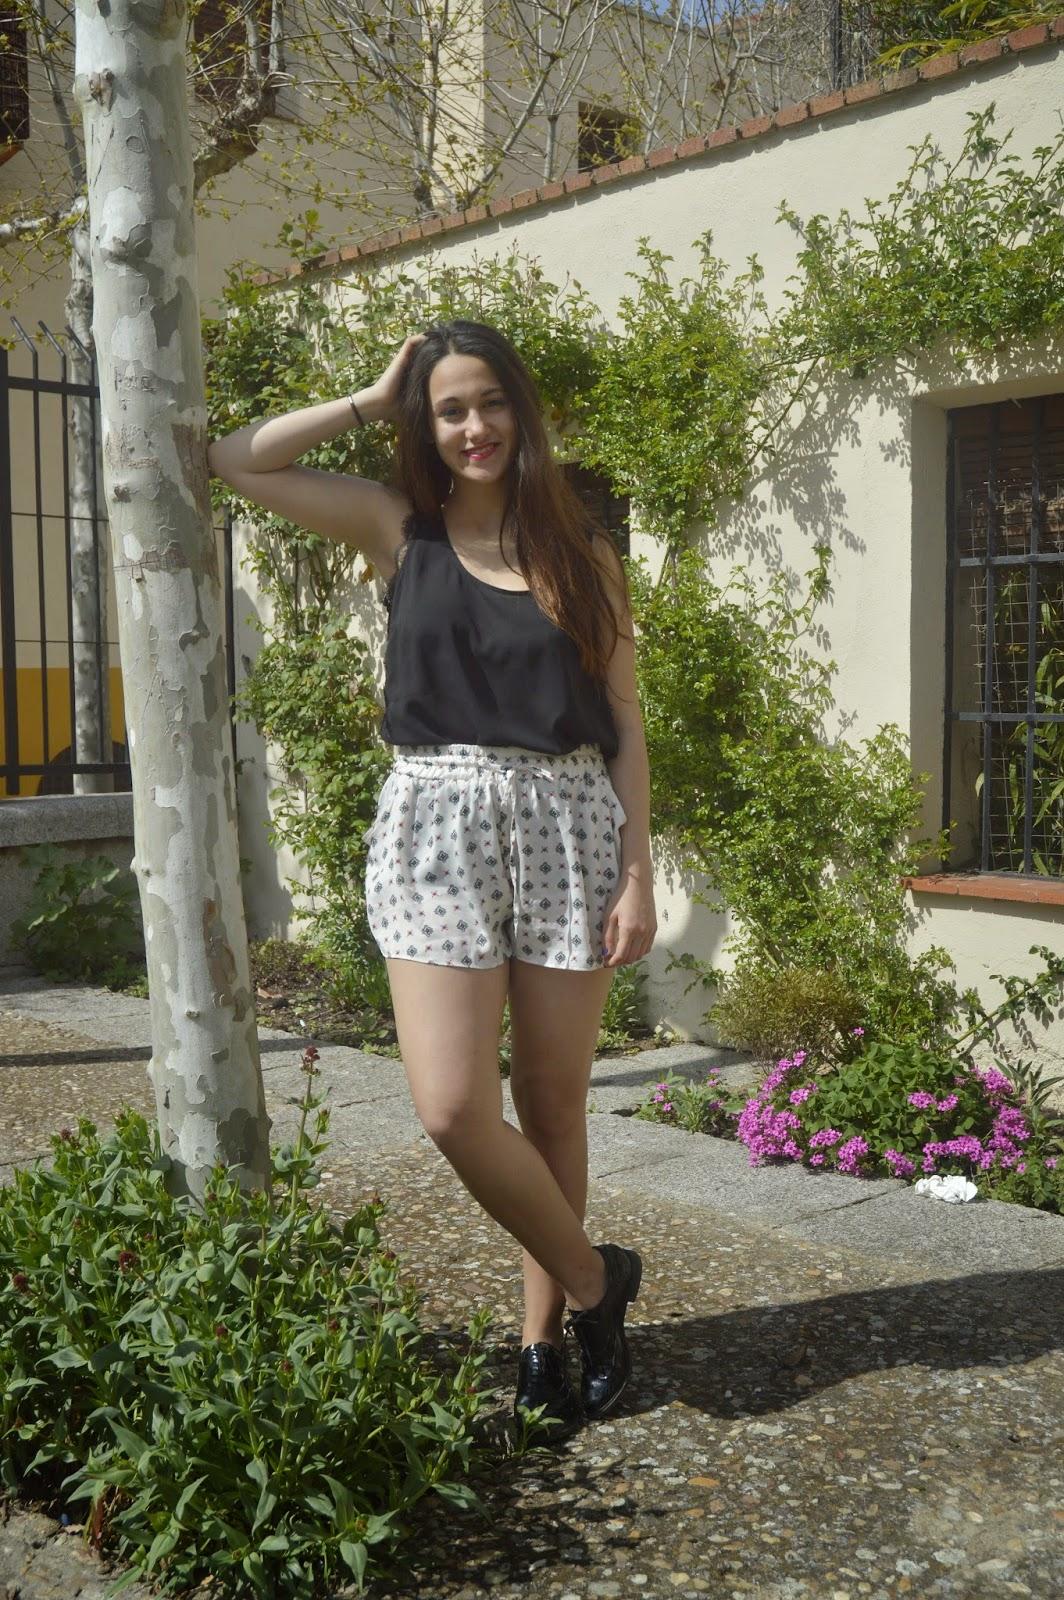 Cat fashion blog calixto and melibea orchard - Jardin de calisto y melibea salamanca ...